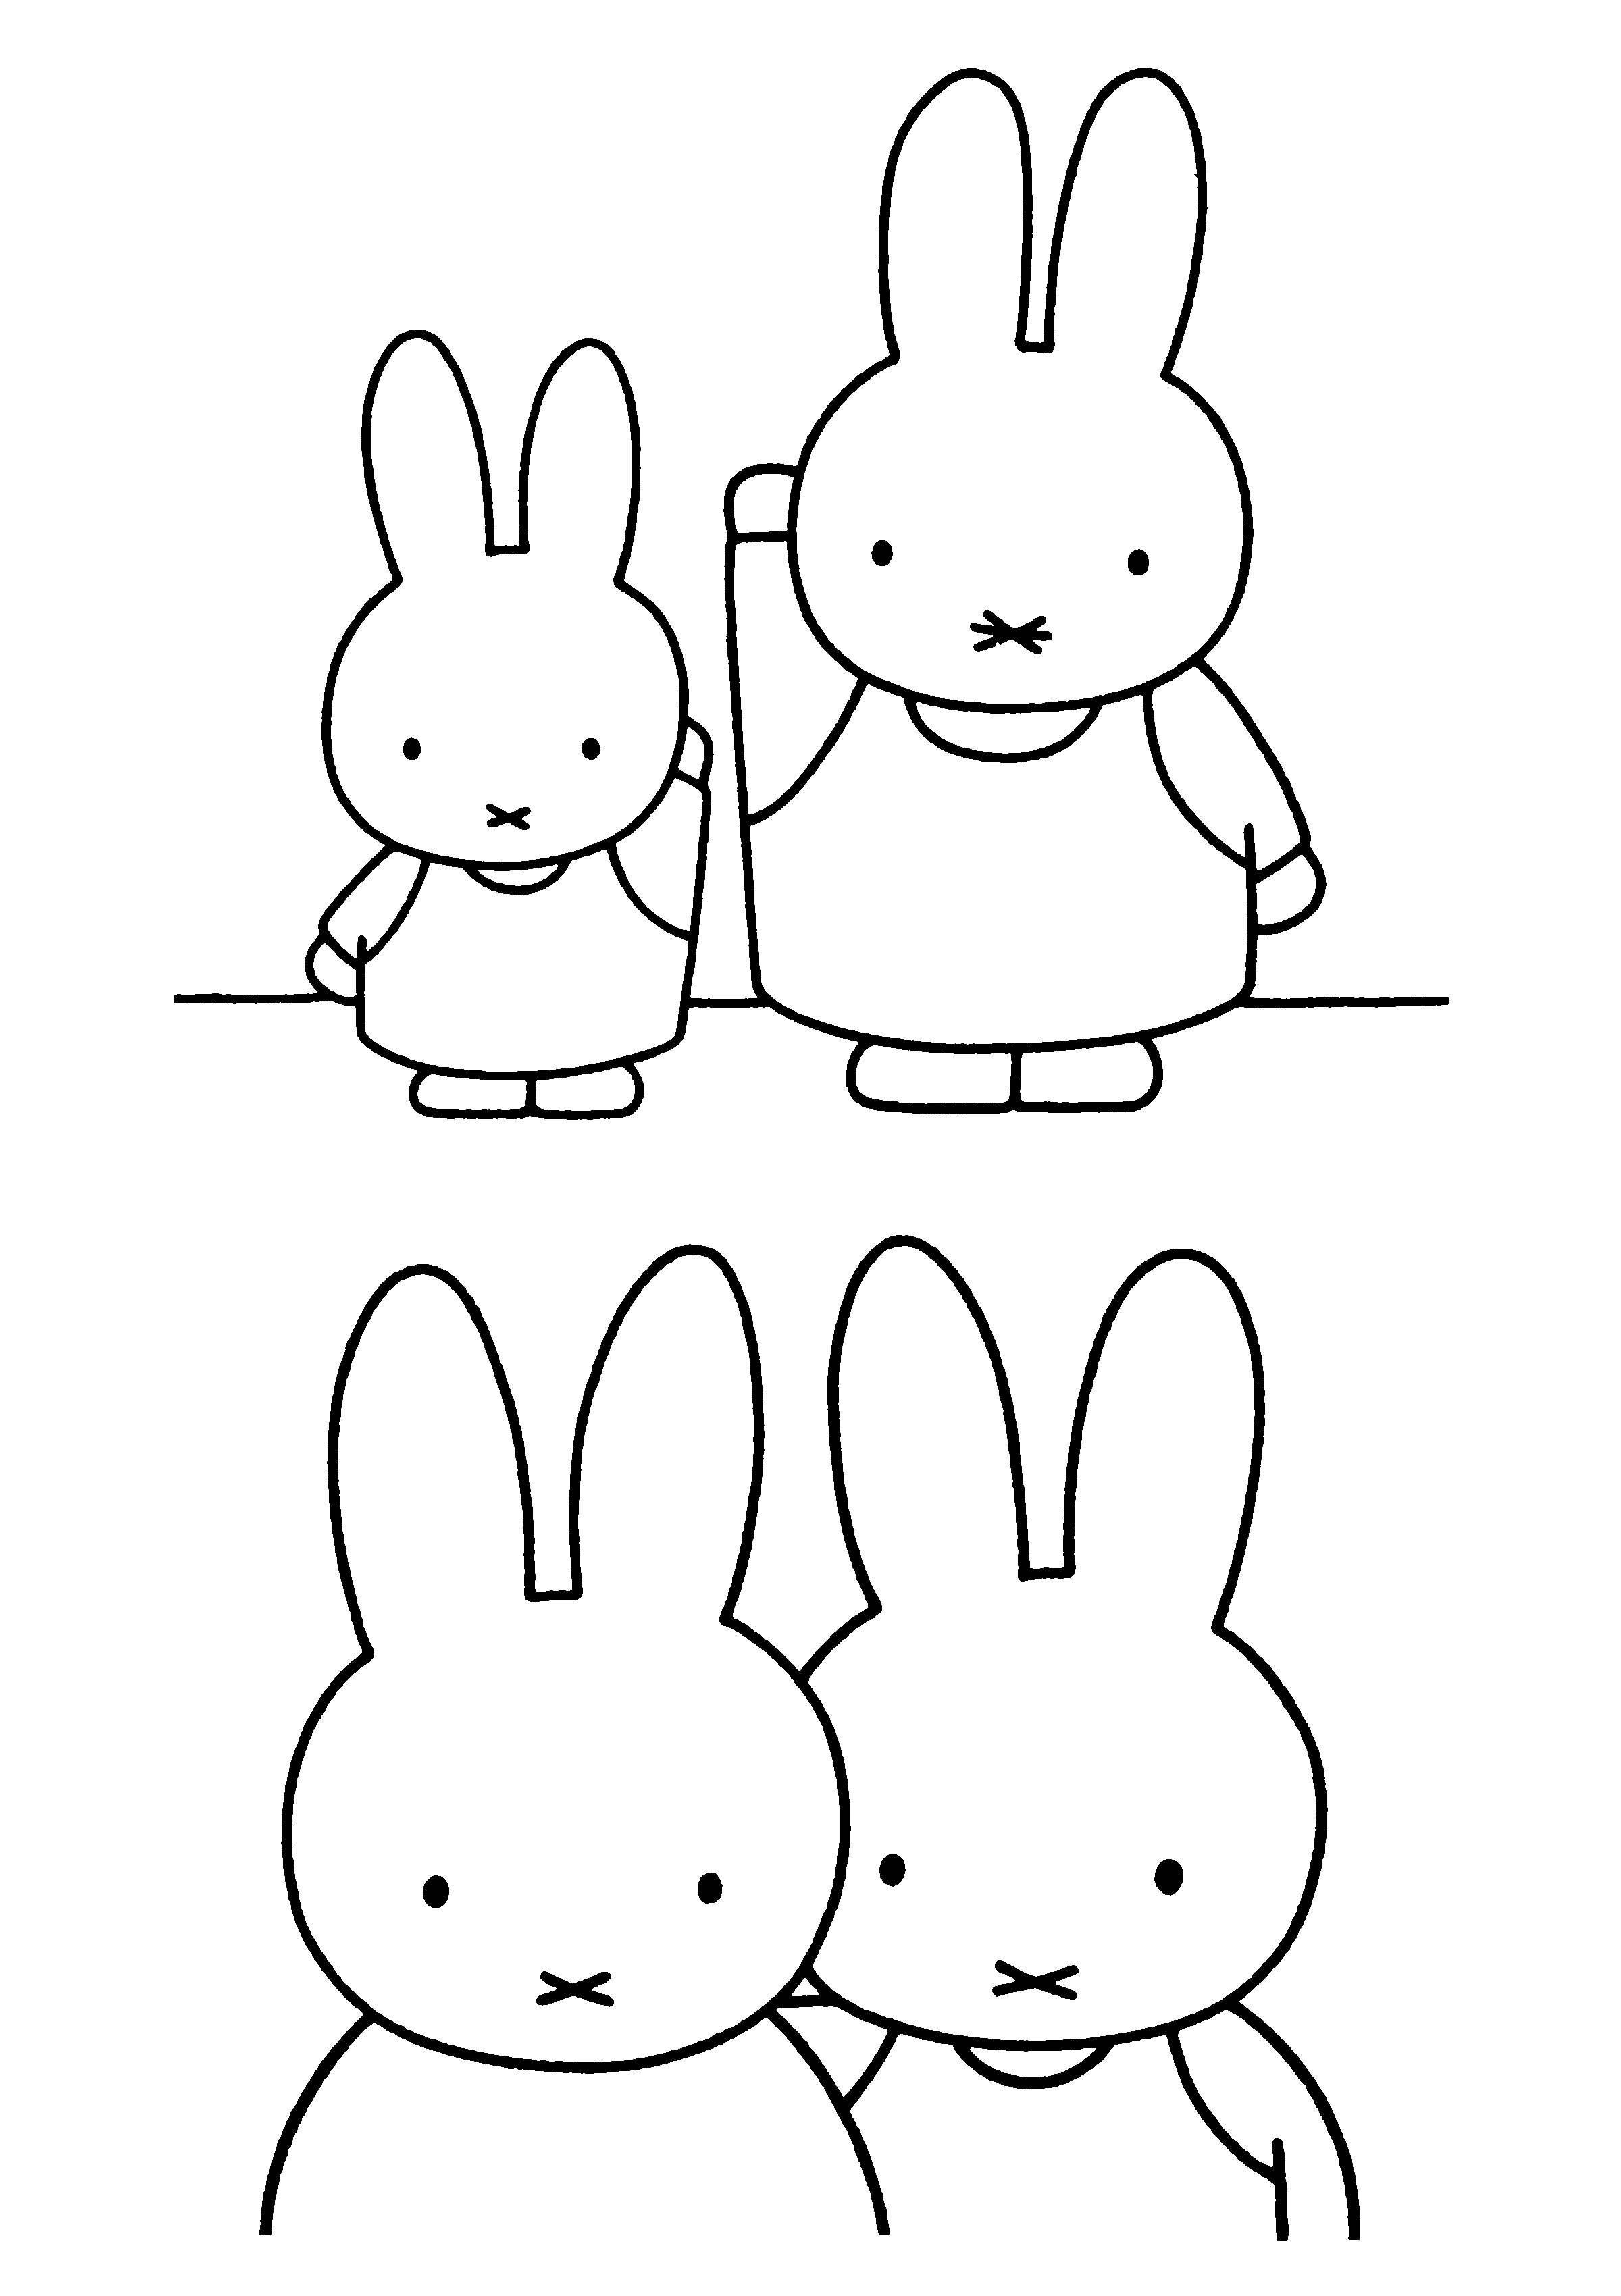 nijntje en haar vriendin kleurplaten konijnentekening